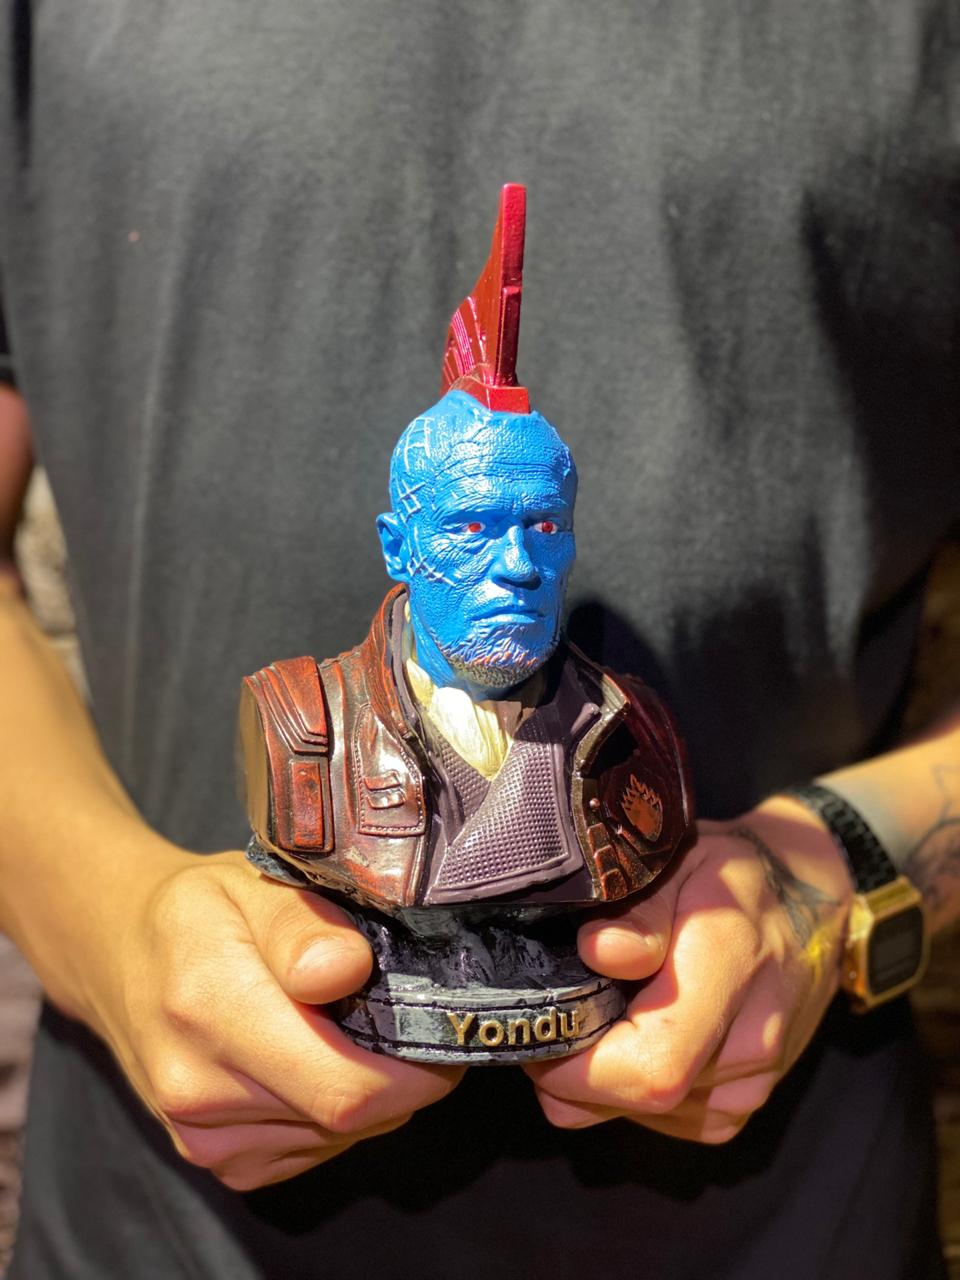 Busto Yondu: Guardiões das Galáxias -  Marvel Comics -wars